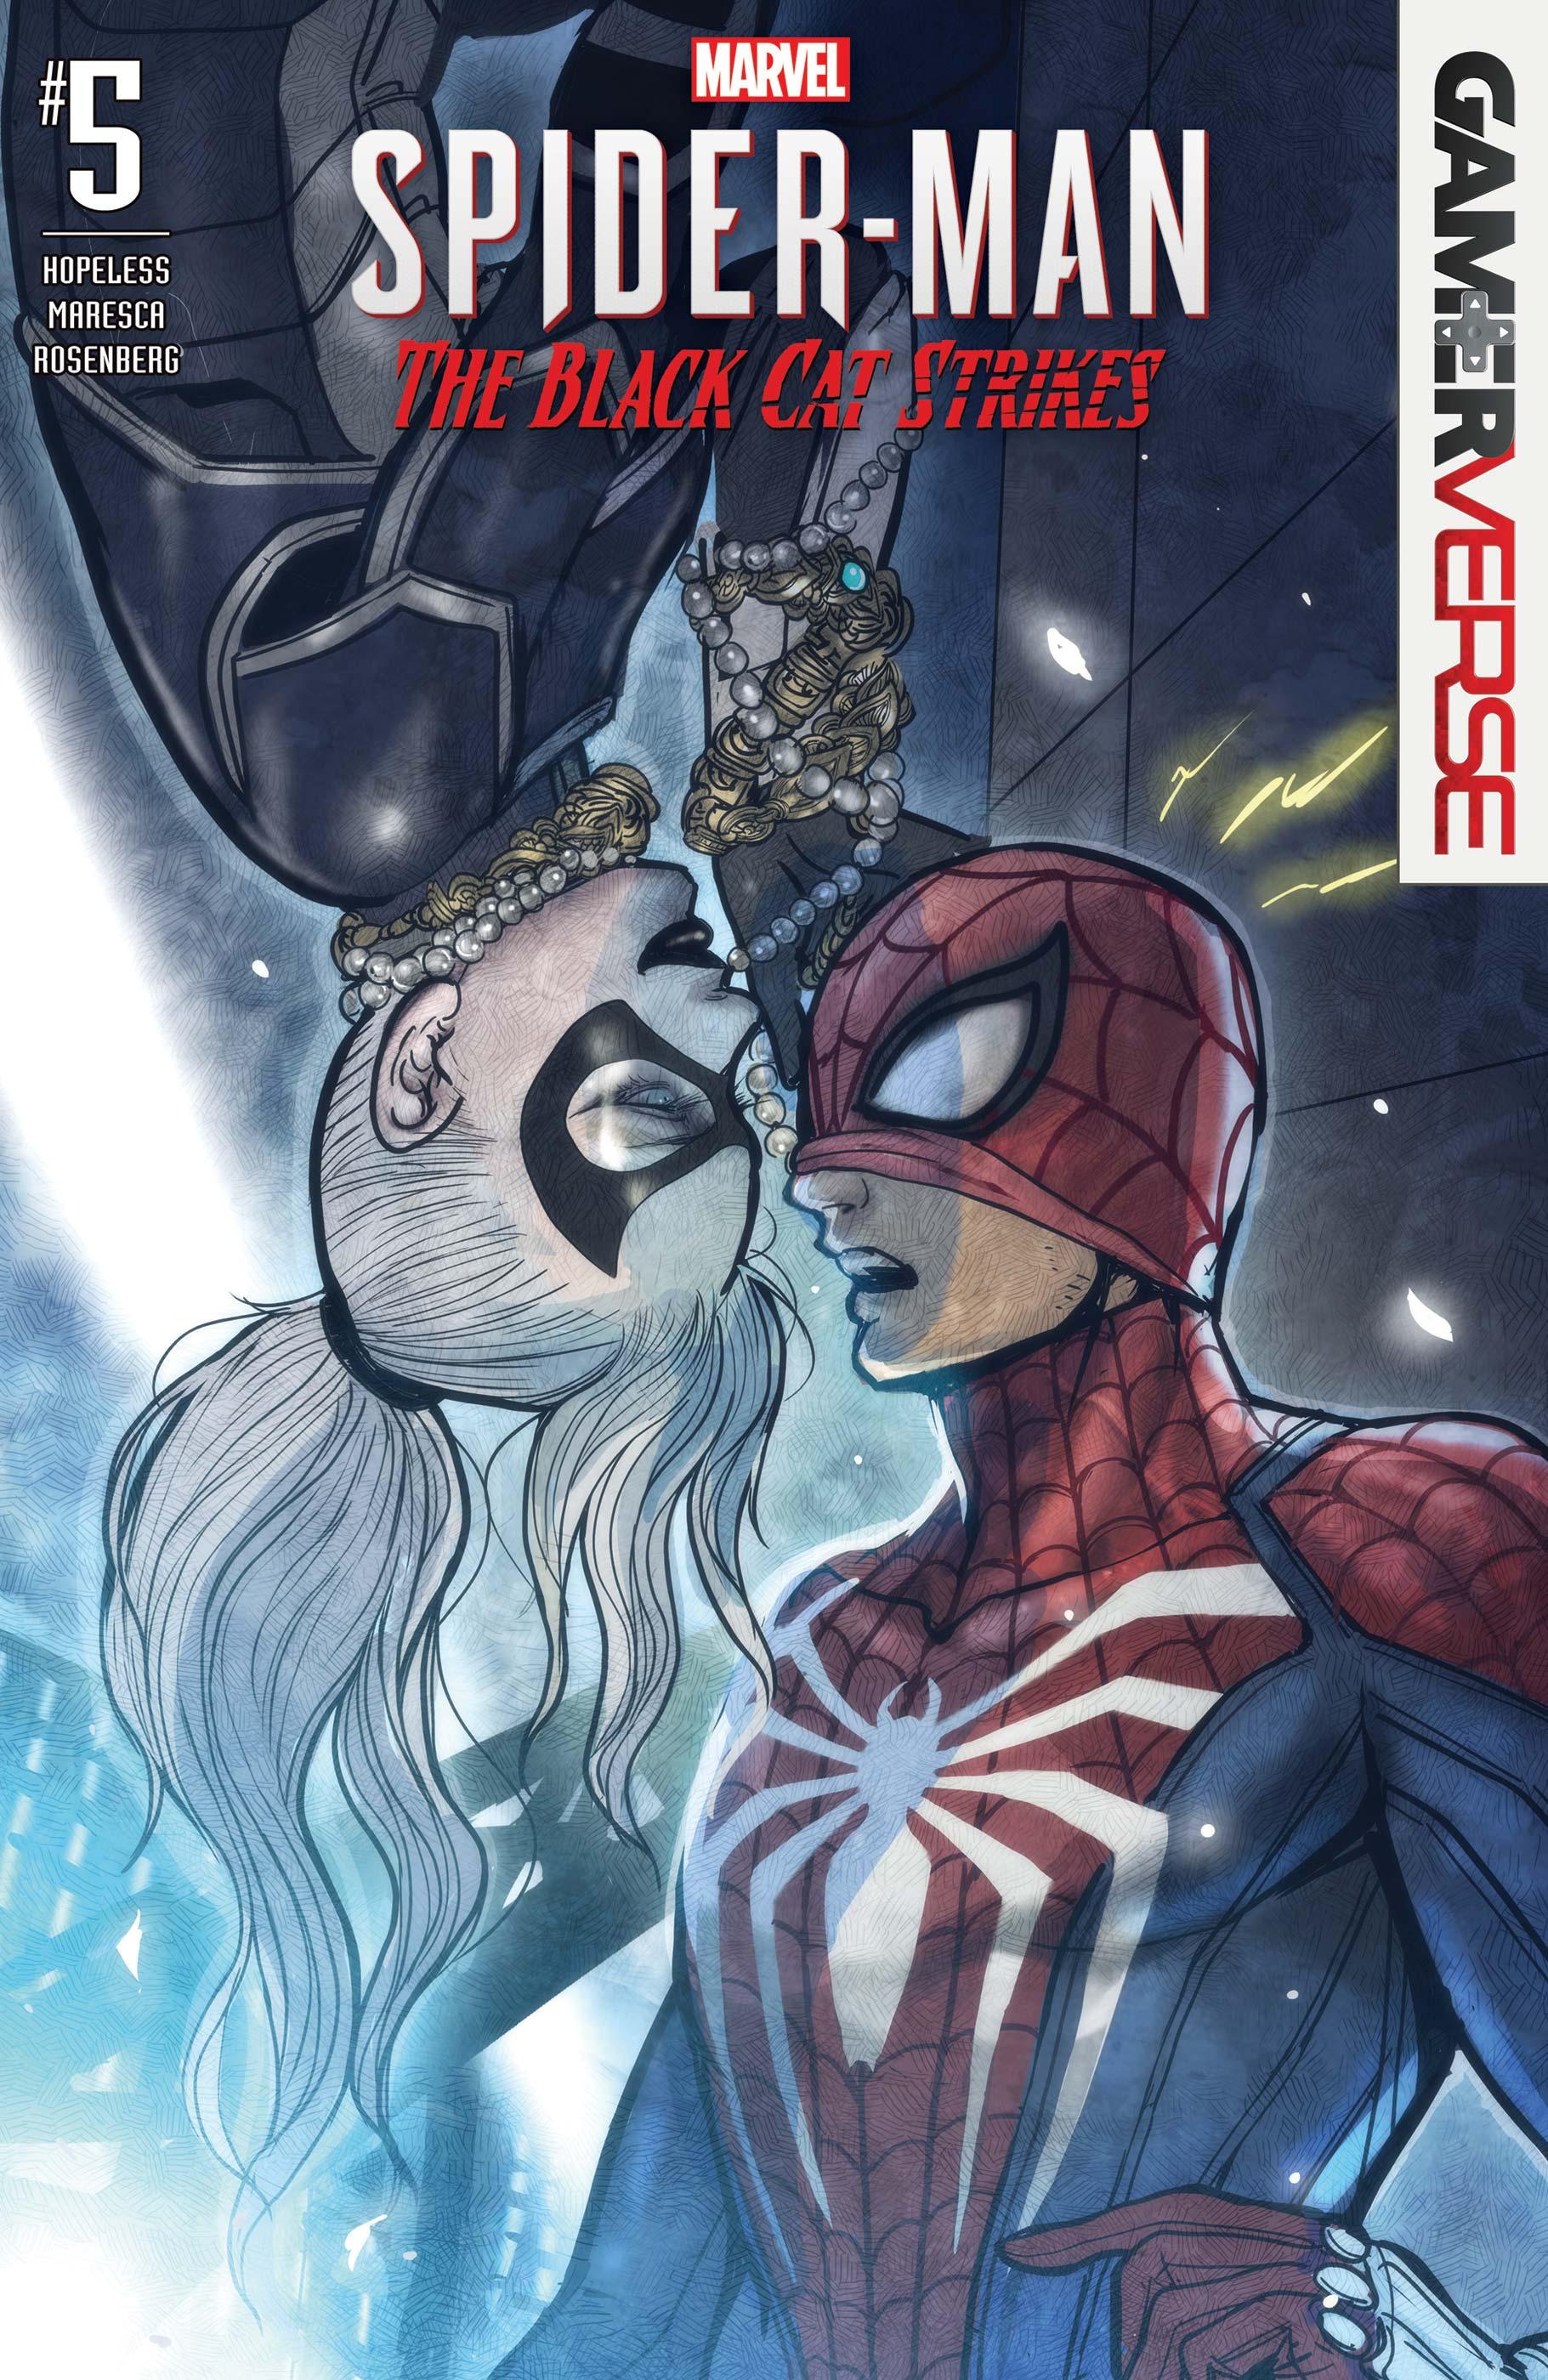 Marvel's Spider-Man: The Black Cat Strikes (2020) #5